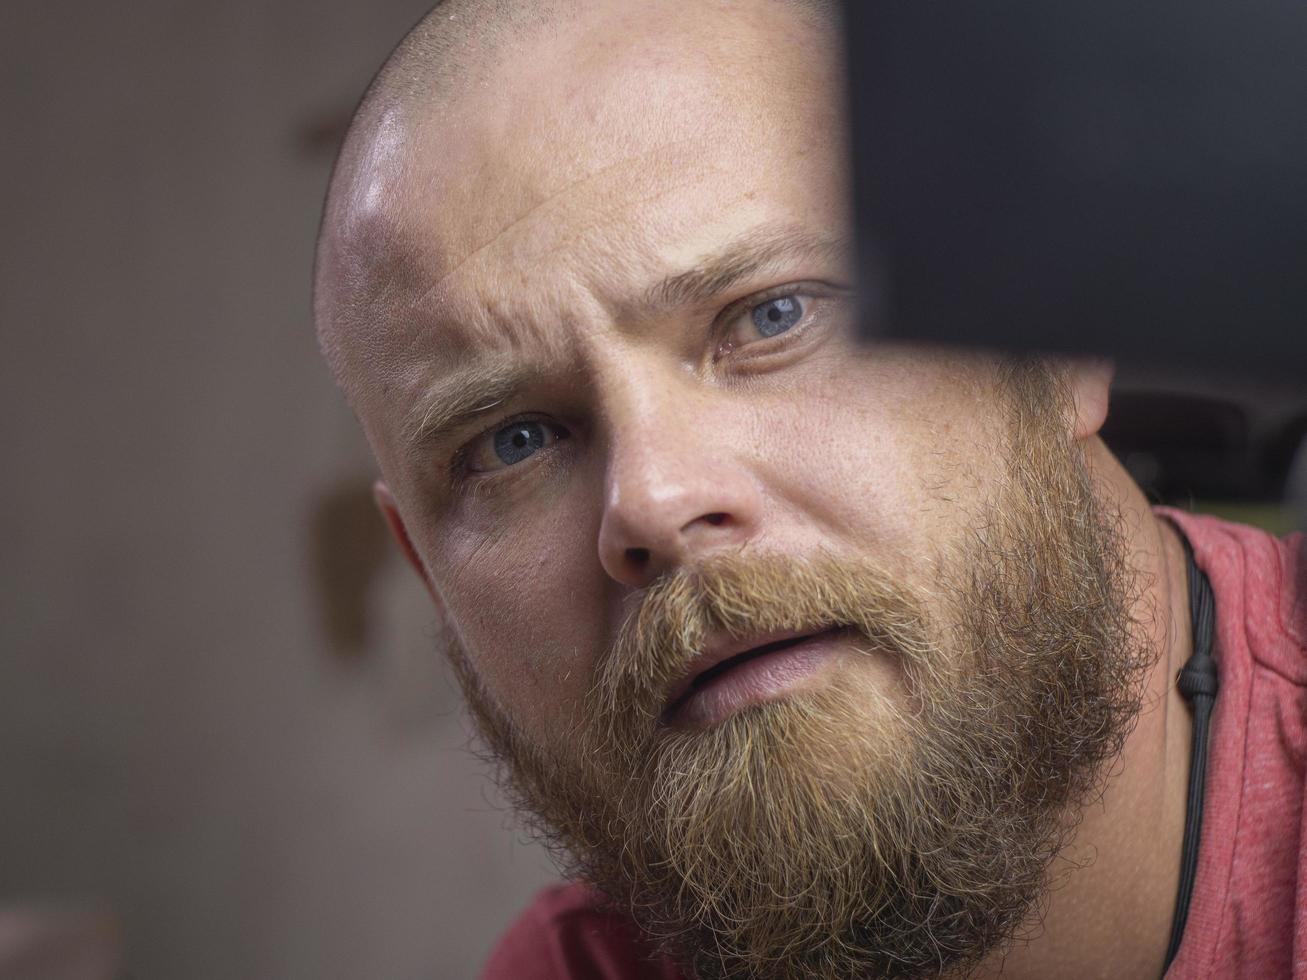 Portrait of a bald man with a beard photo